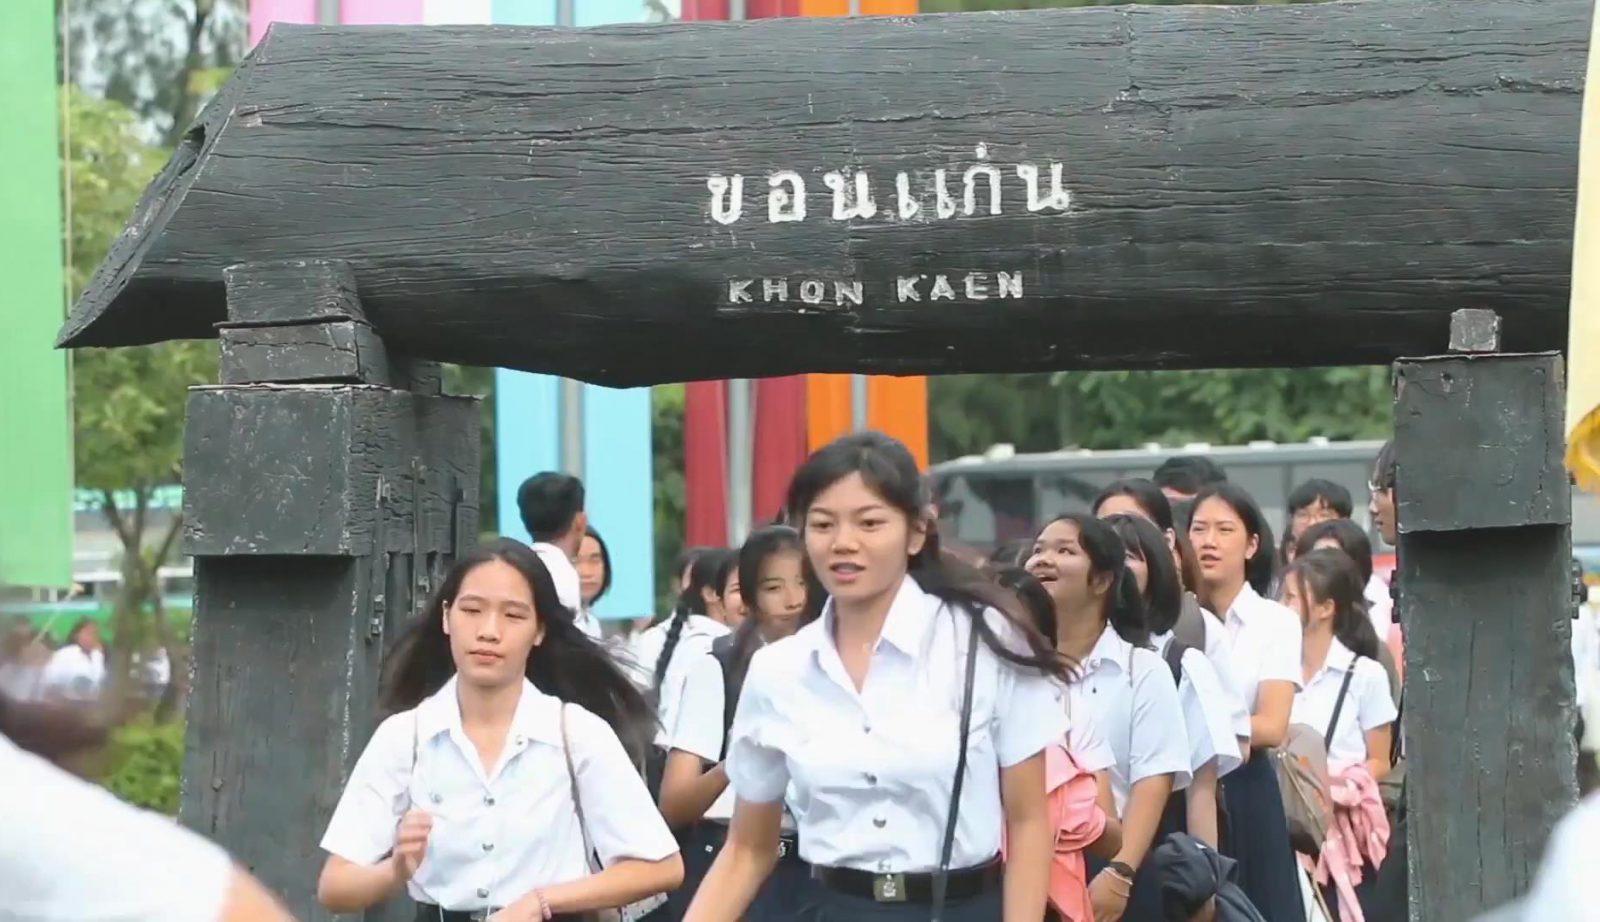 KKU - International Students Testimonial